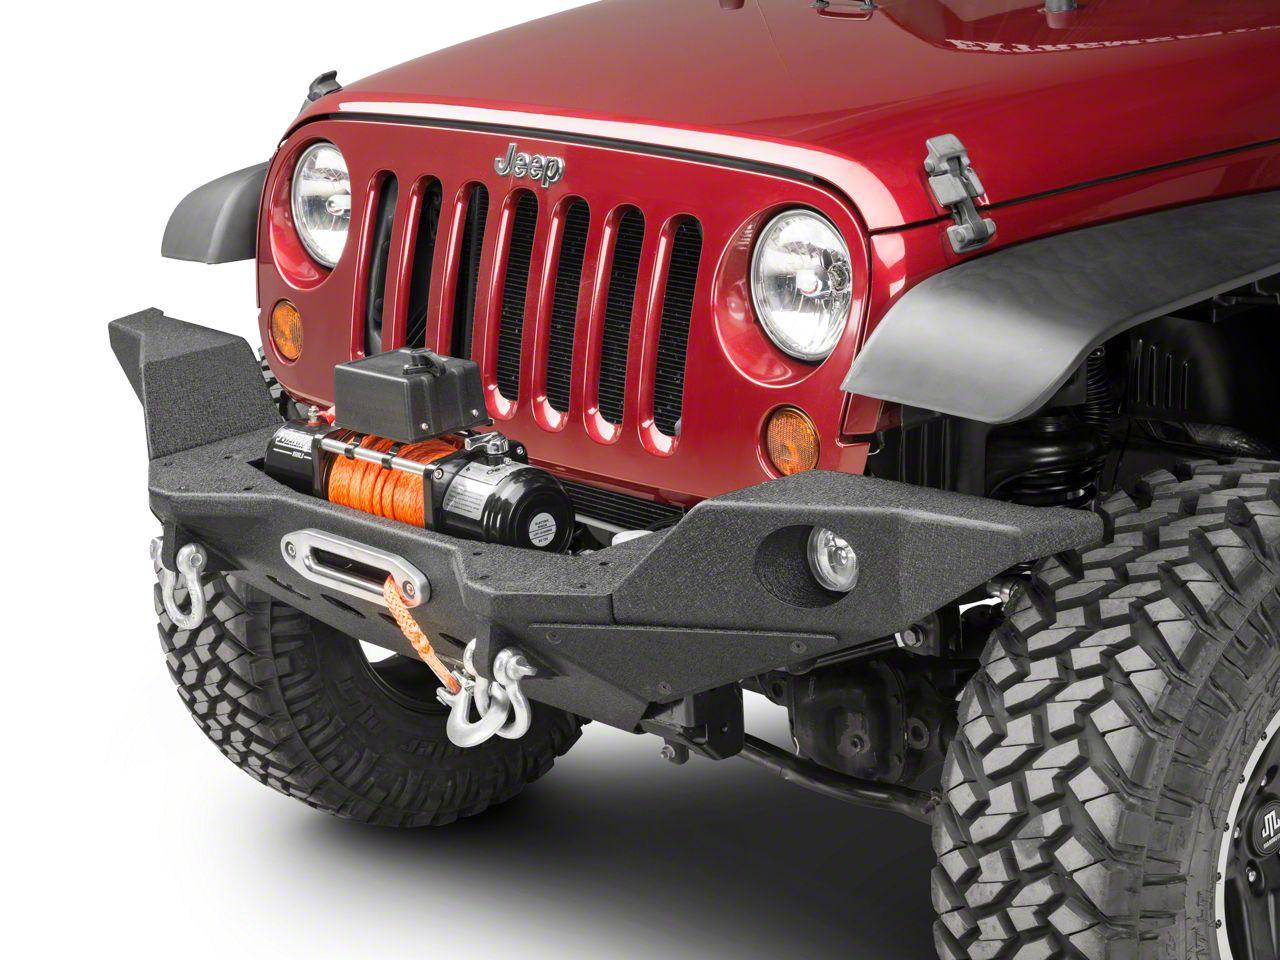 Smittybilt XRC M.O.D. Full Width End Caps - Textured Matte Black (07-18 Jeep Wrangler JK; 2018 Jeep Wrangler JL)